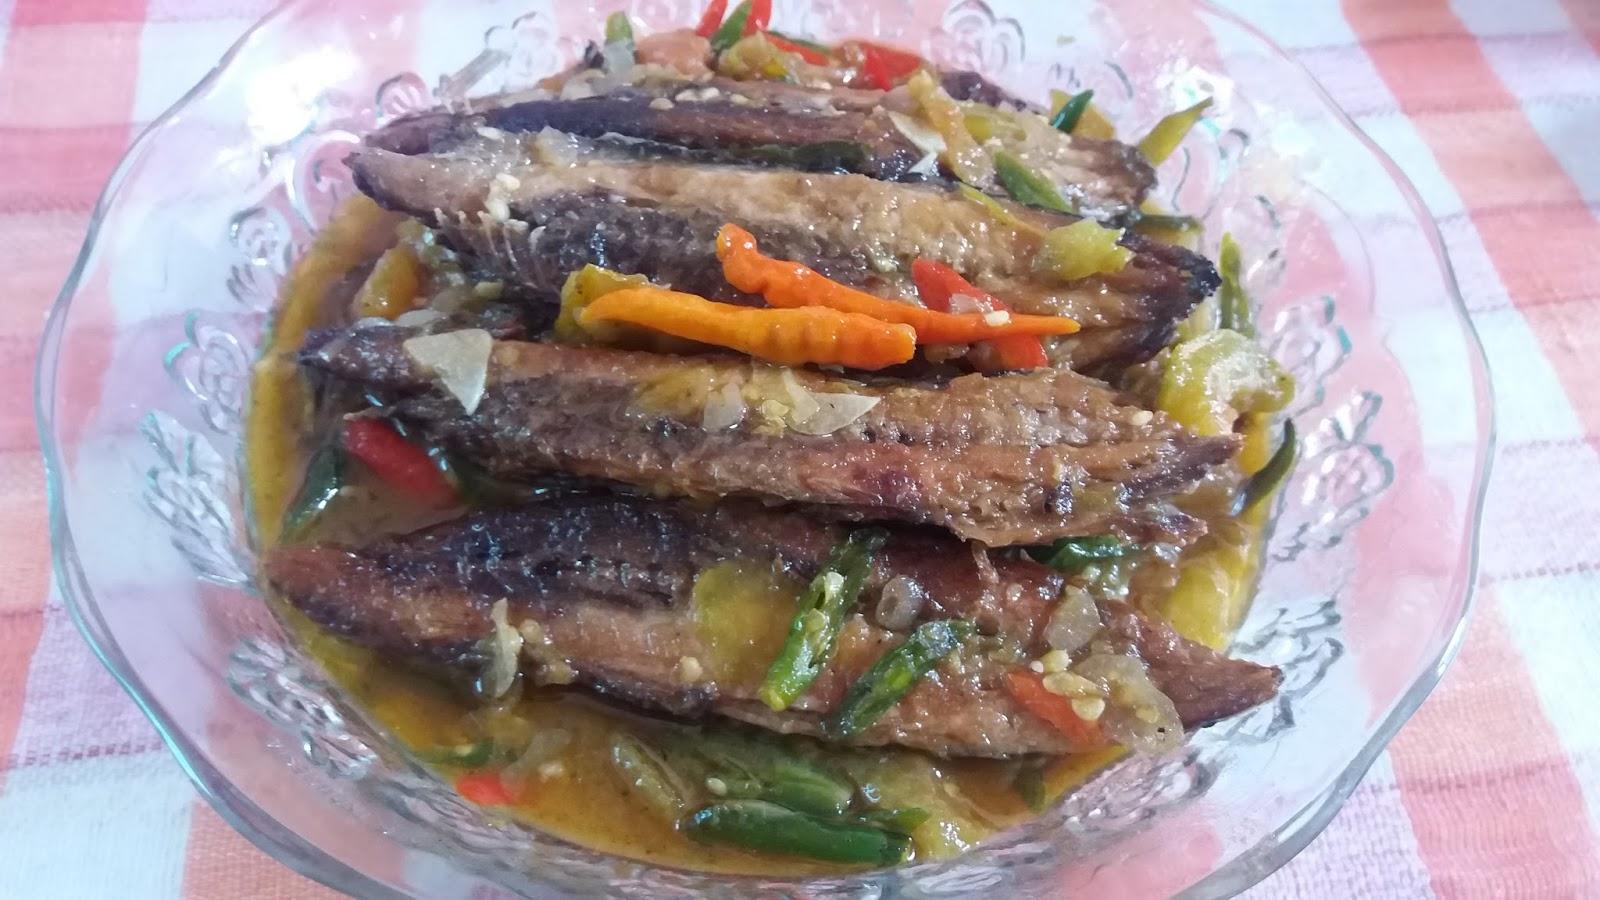 Resep Oseng Gereh Ikan Salem Ala Debora Aneka Resep Jajanan Indonesia